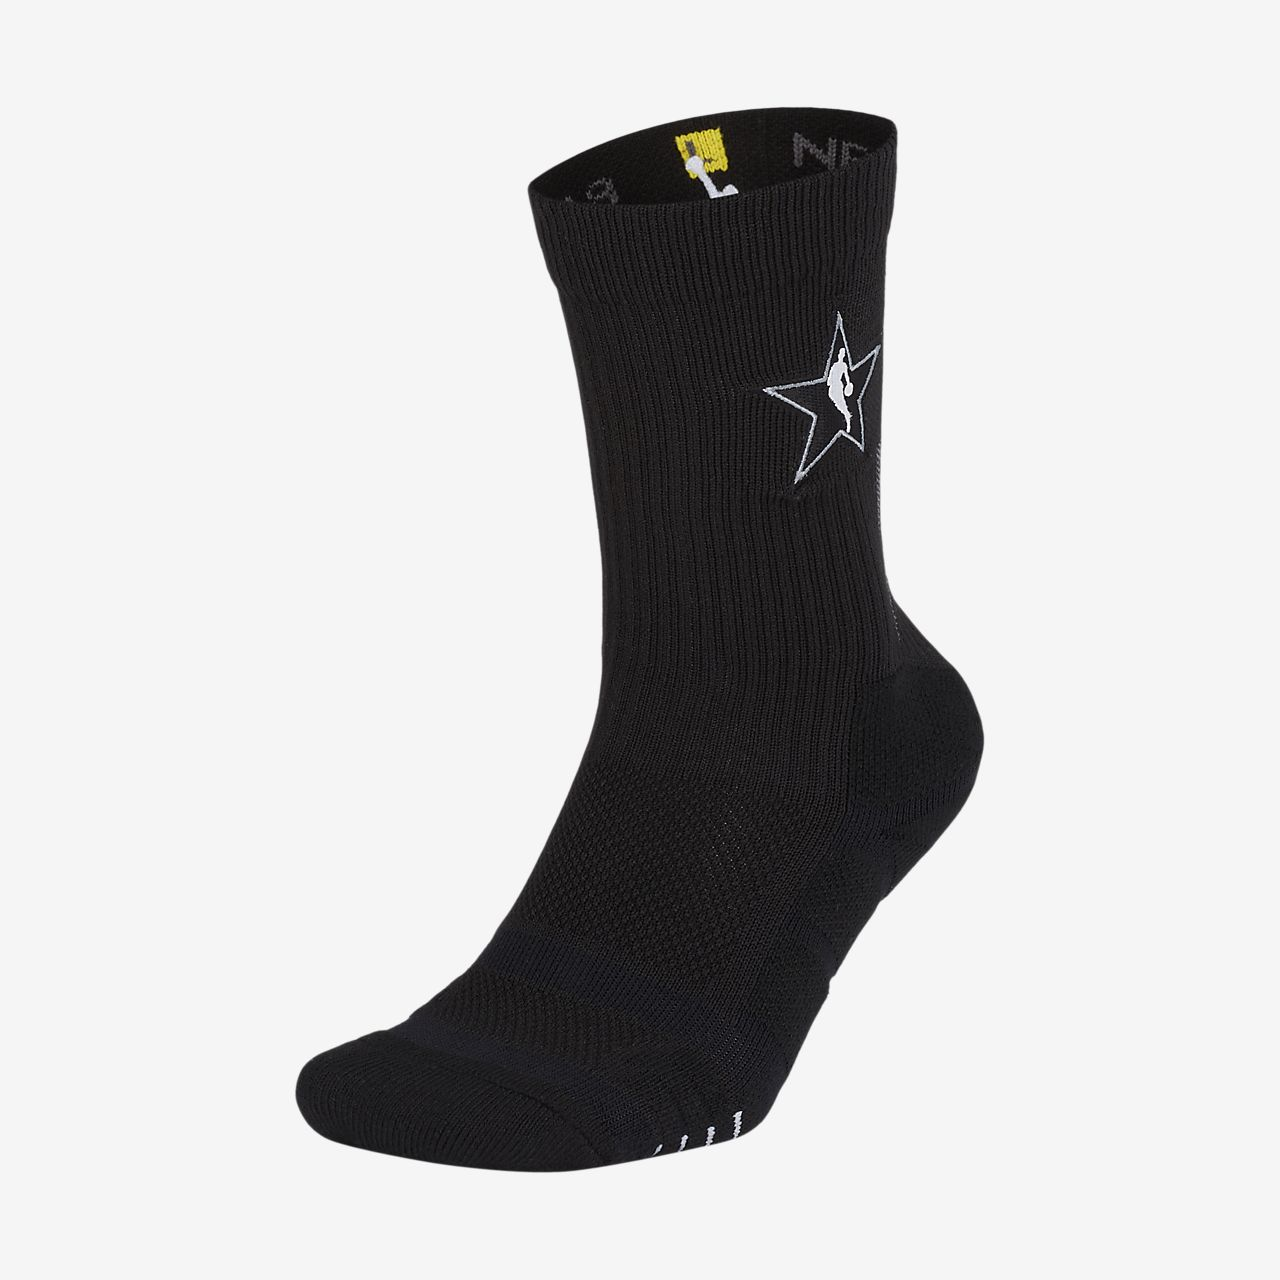 low priced fa50a 2e855 ... All-Star Edition Nike Elite Quick Unisex NBA Crew Socks